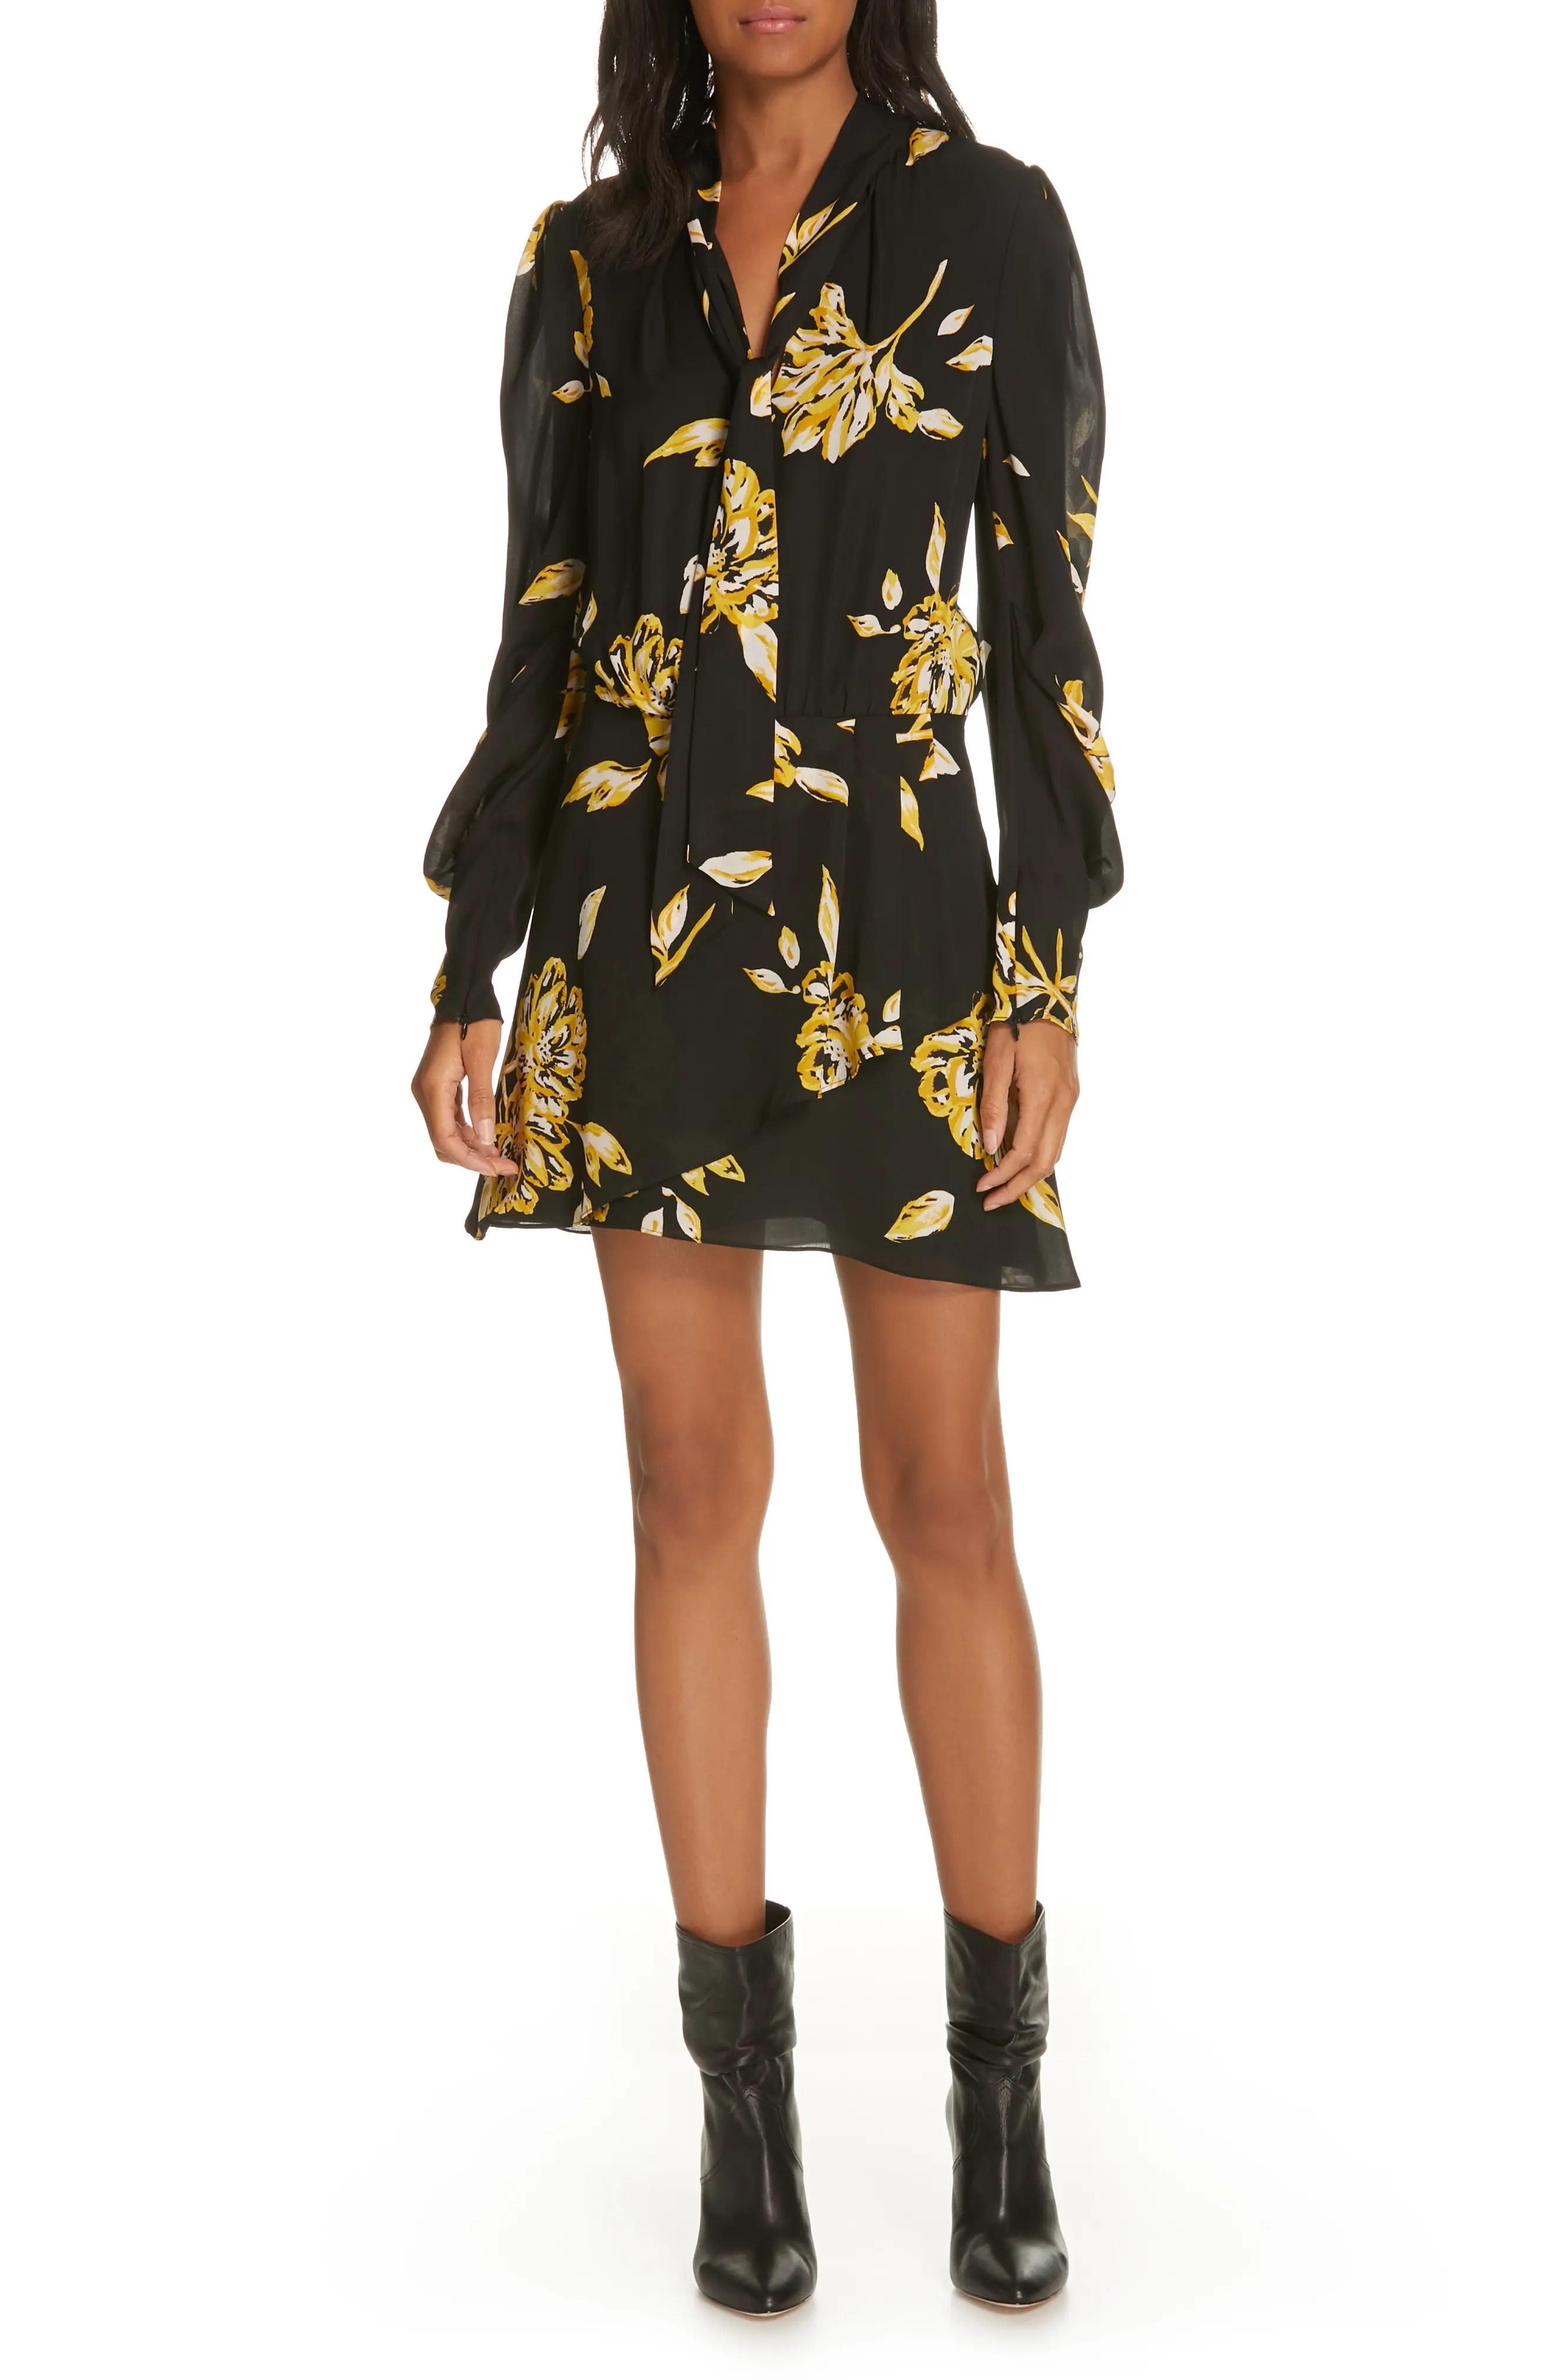 Joie gyan floral silk dress also clothing nordstrom rh shoprdstrom